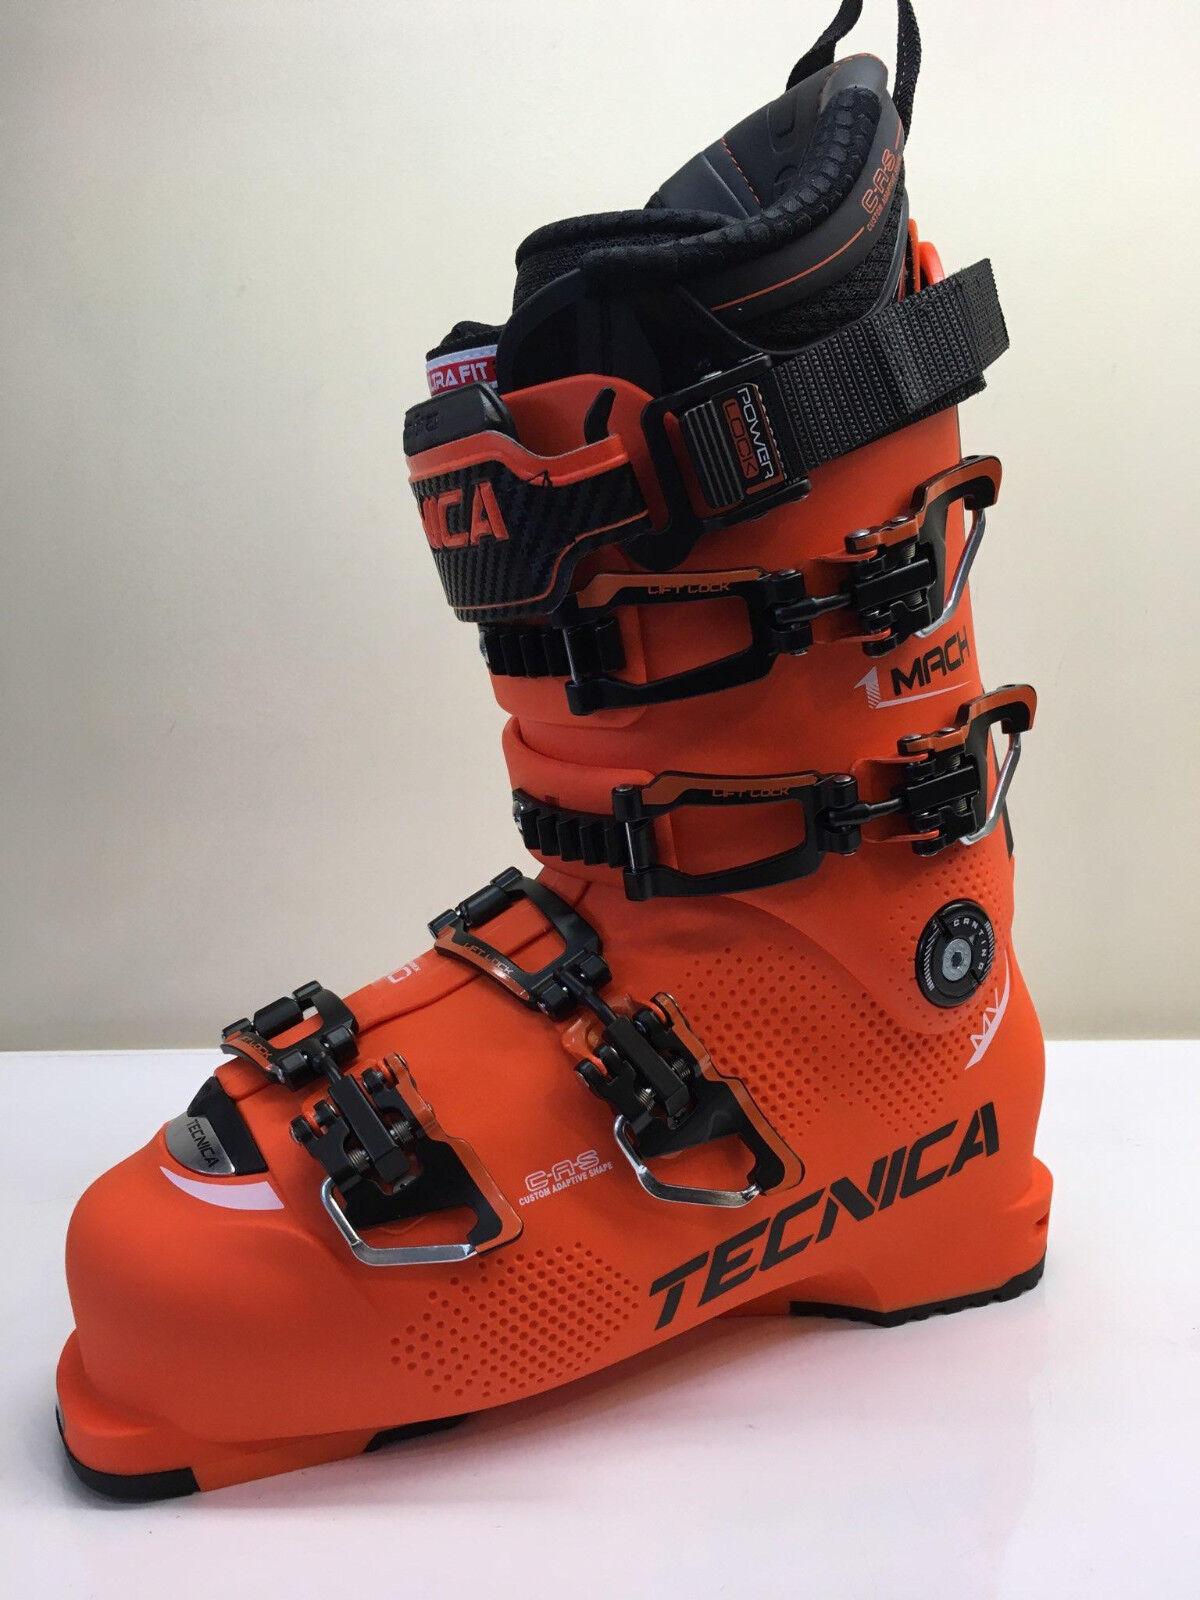 Tecnica Mach1 130 MV Ski Boots - Men's - 2019 - 26.5 MP   US 8.5 US